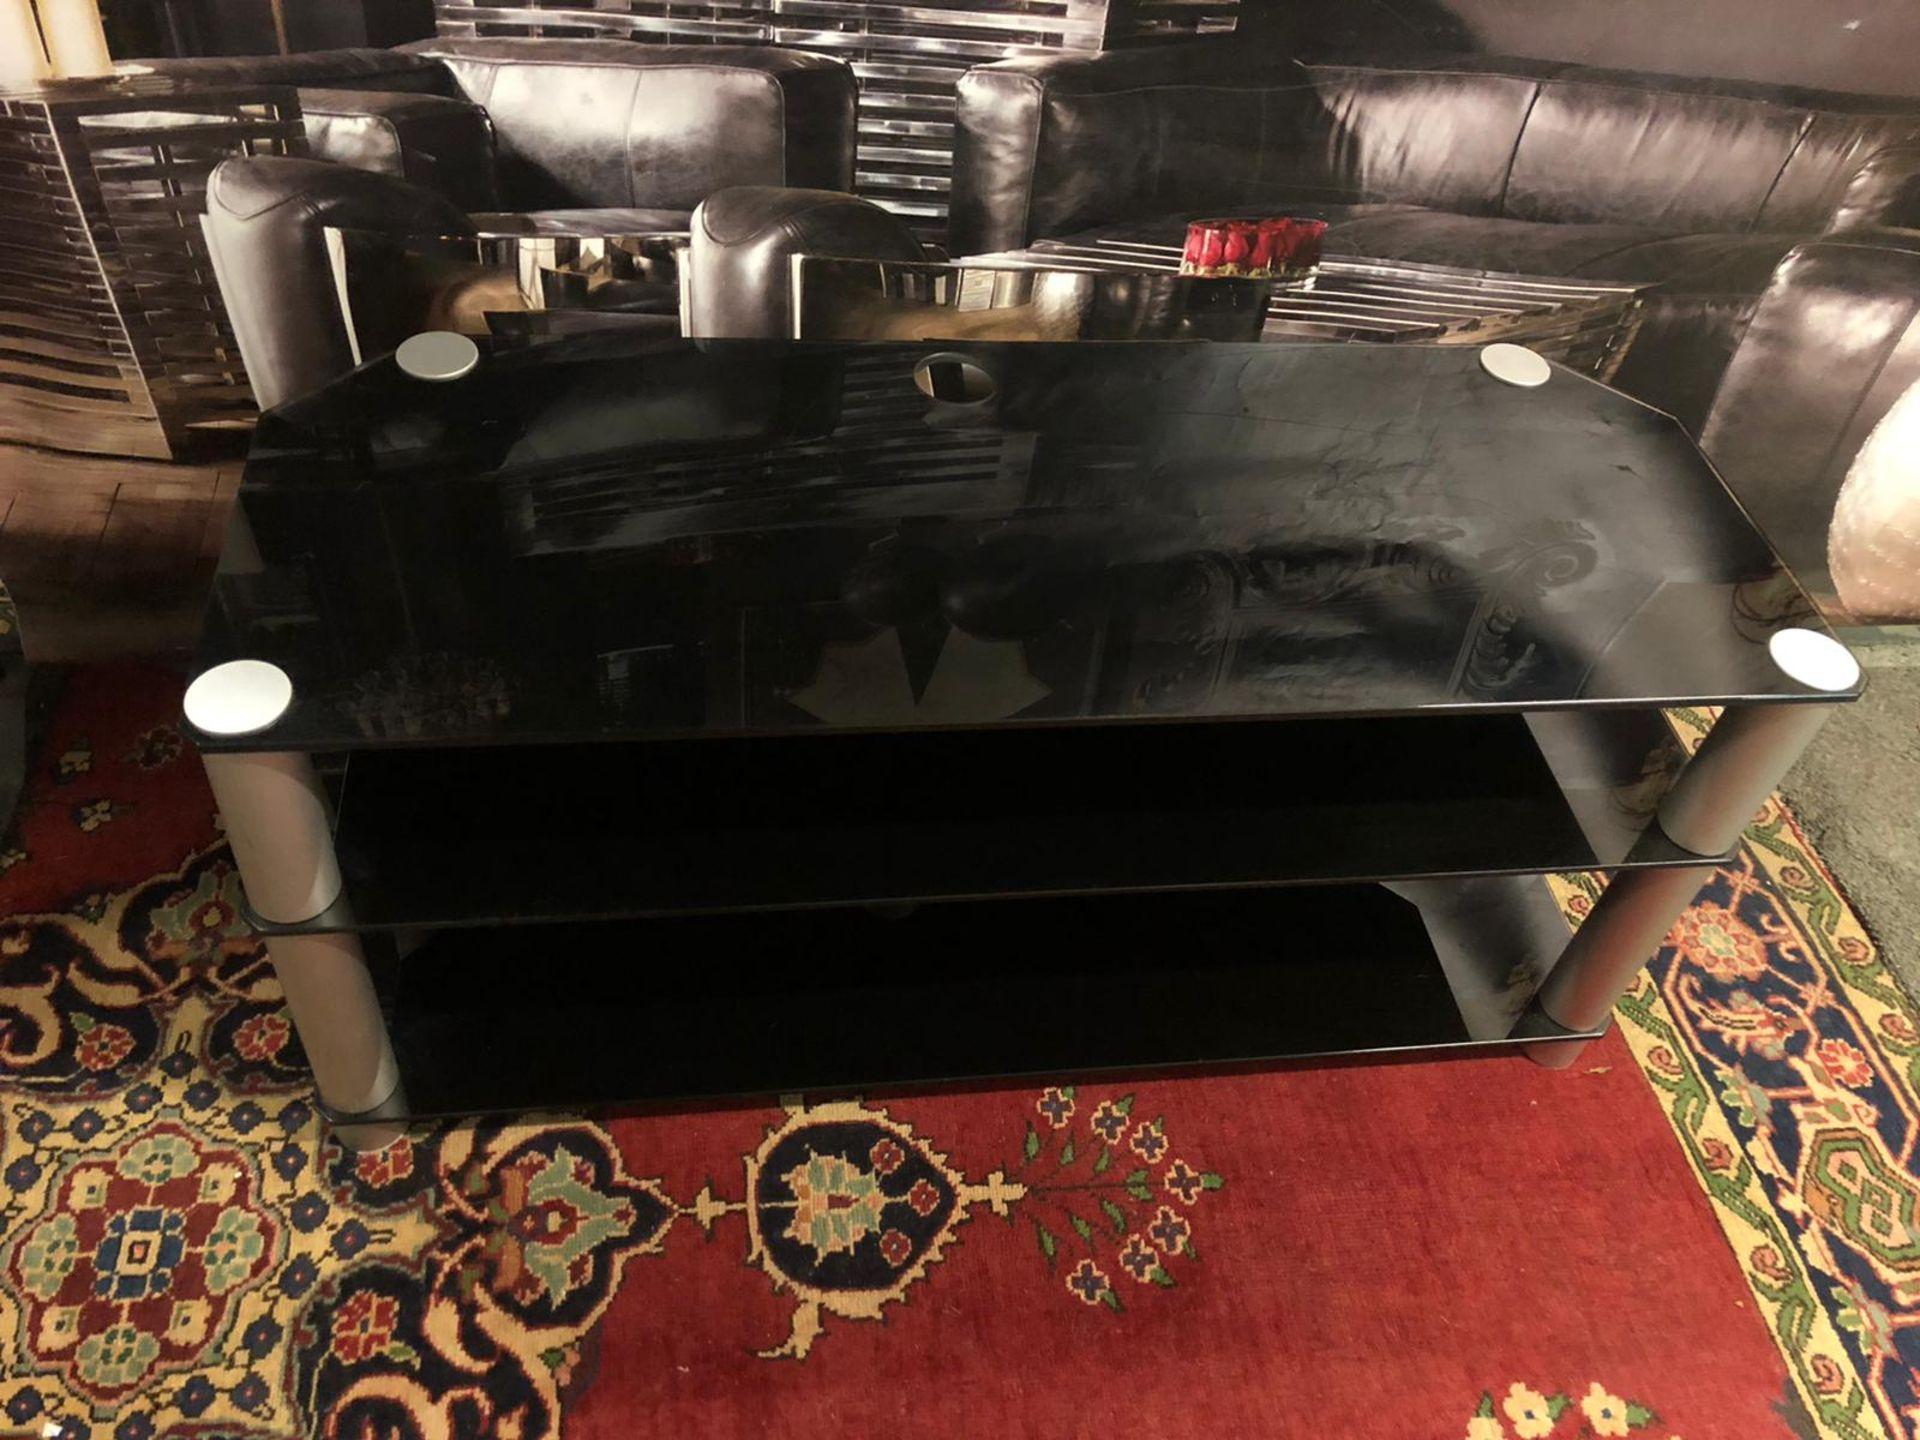 3-Tier TV Media Stand Component Console Multipurpose Shelf Display-Black 120 x 45 x 54cm - Image 3 of 3